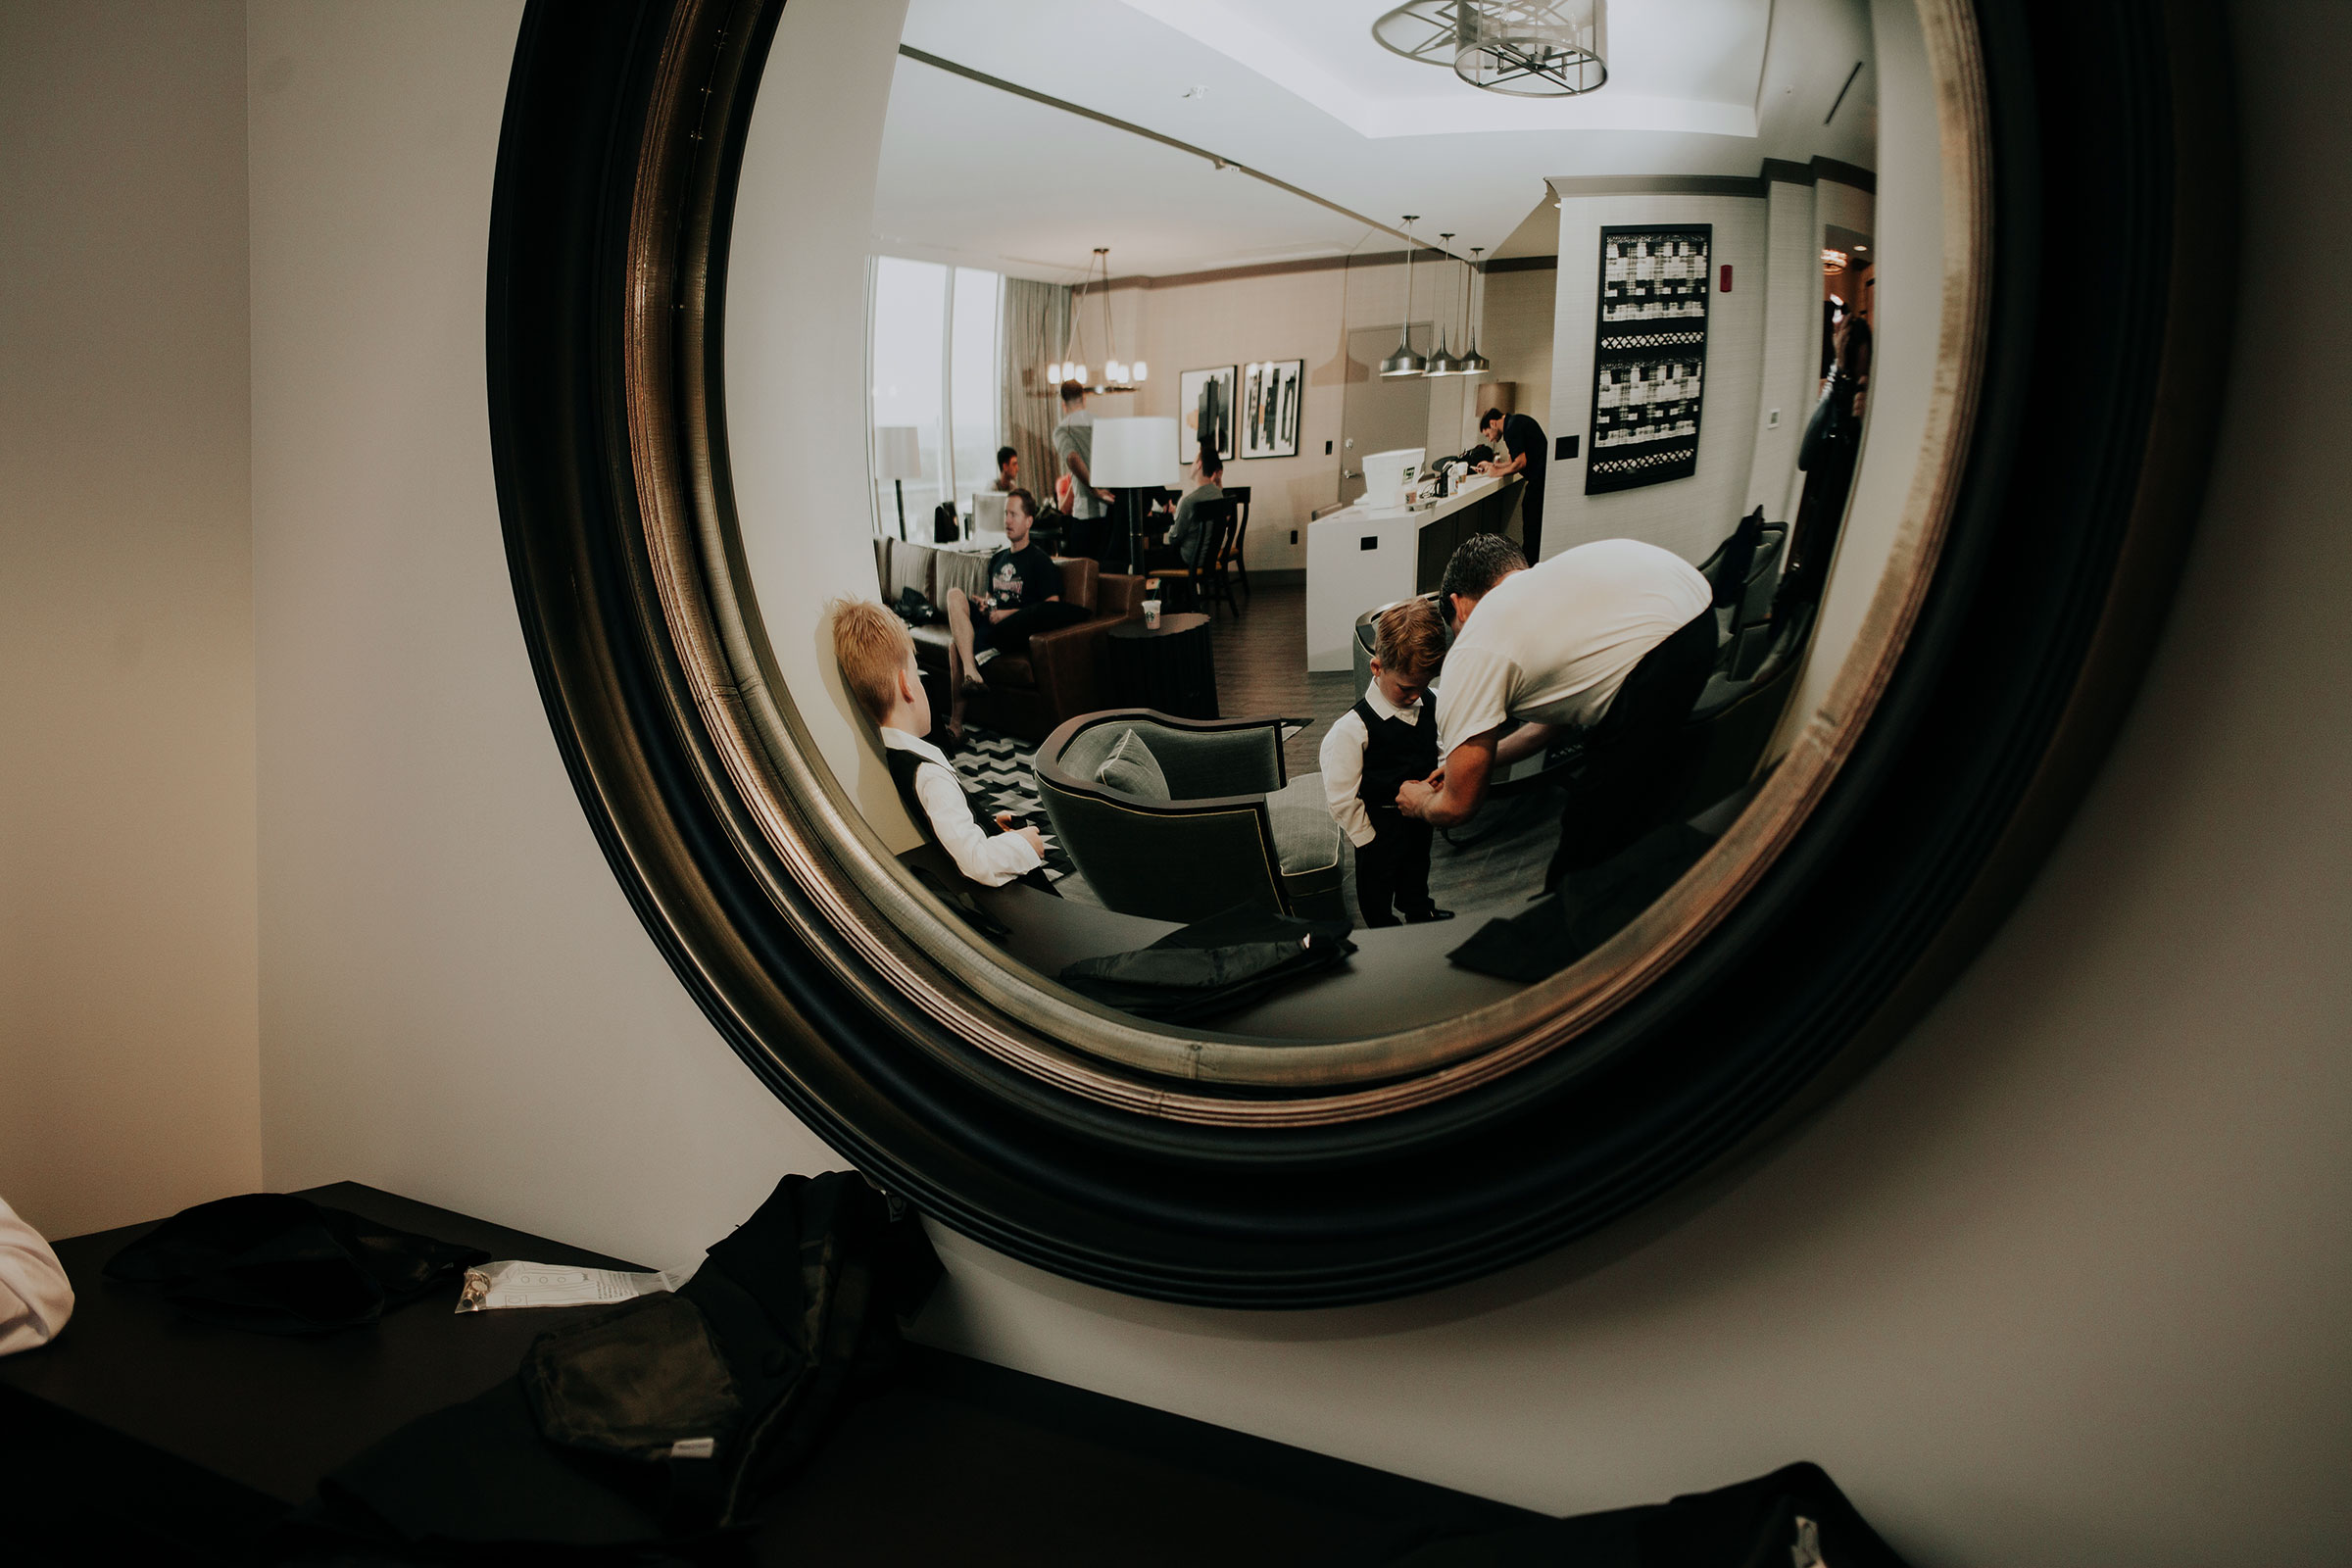 groomsmen-helping-kids-get-ready-through-mirror-hilton-omaha-nebraska-raelyn-ramey-photography.jpg